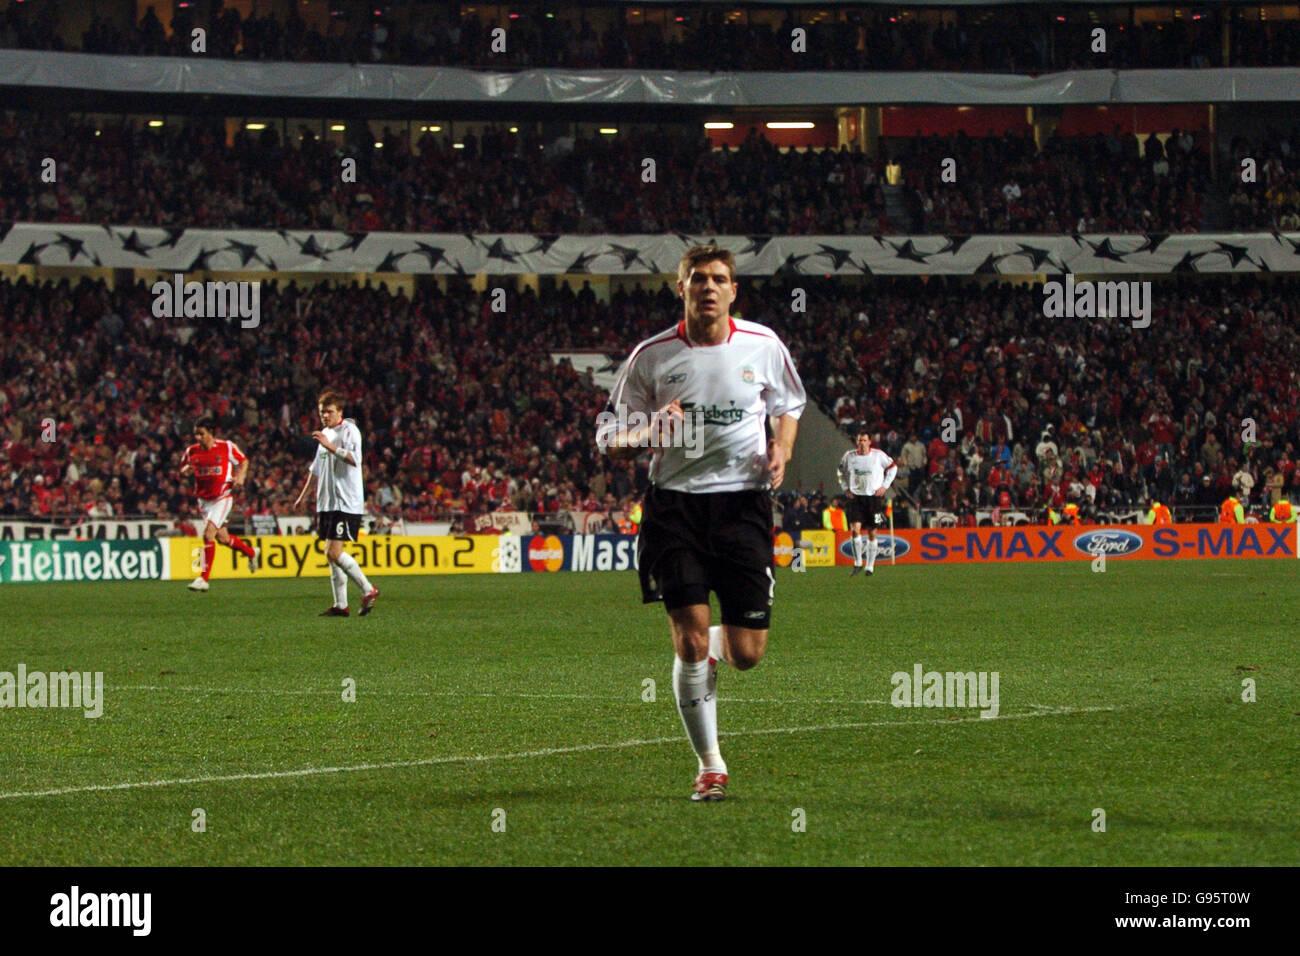 [Imagen: soccer-uefa-champions-league-round-of-16...G95T0W.jpg]